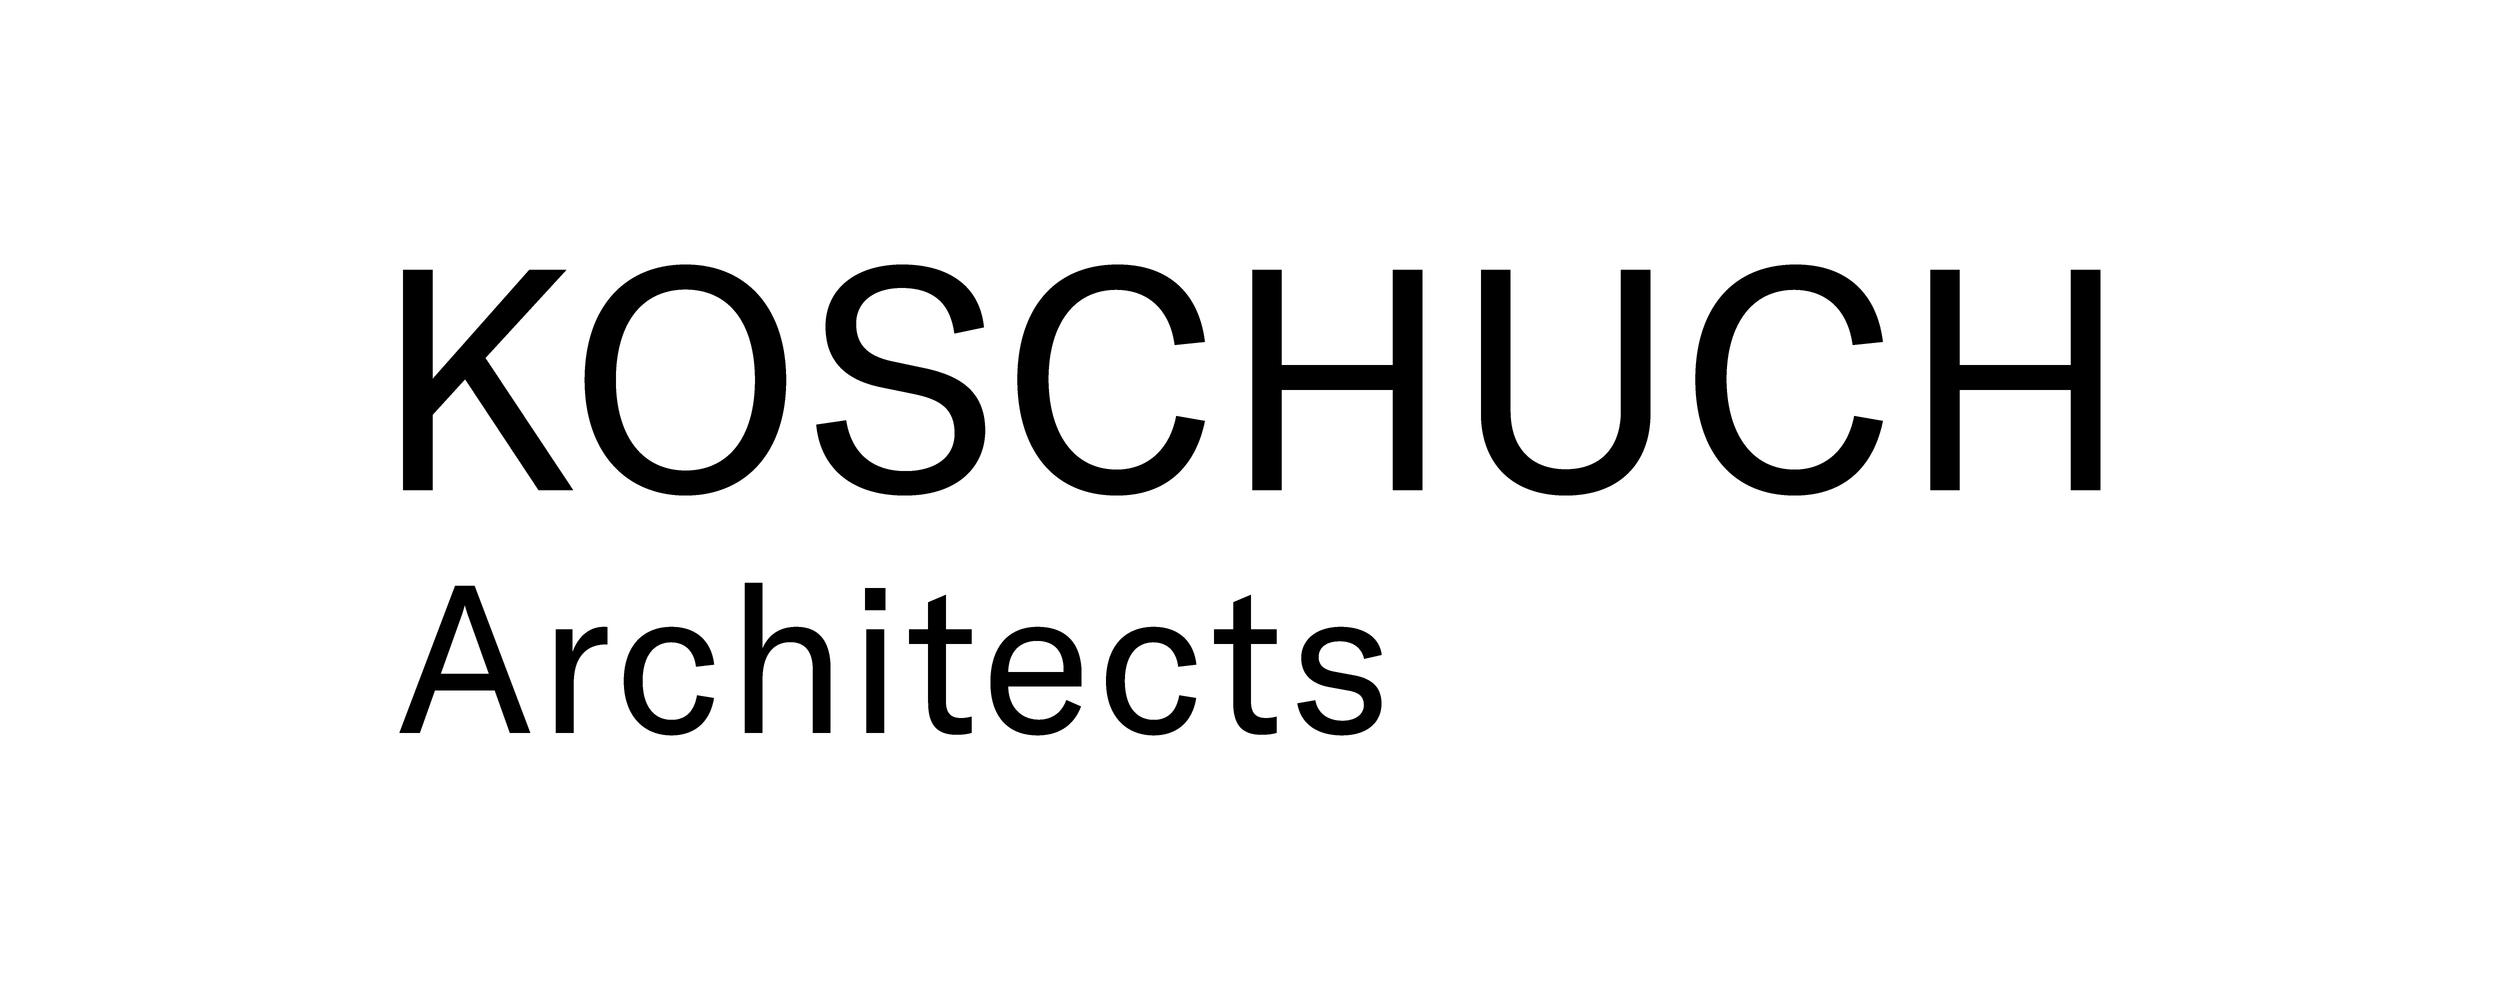 KoschuchArchitects@4x.png